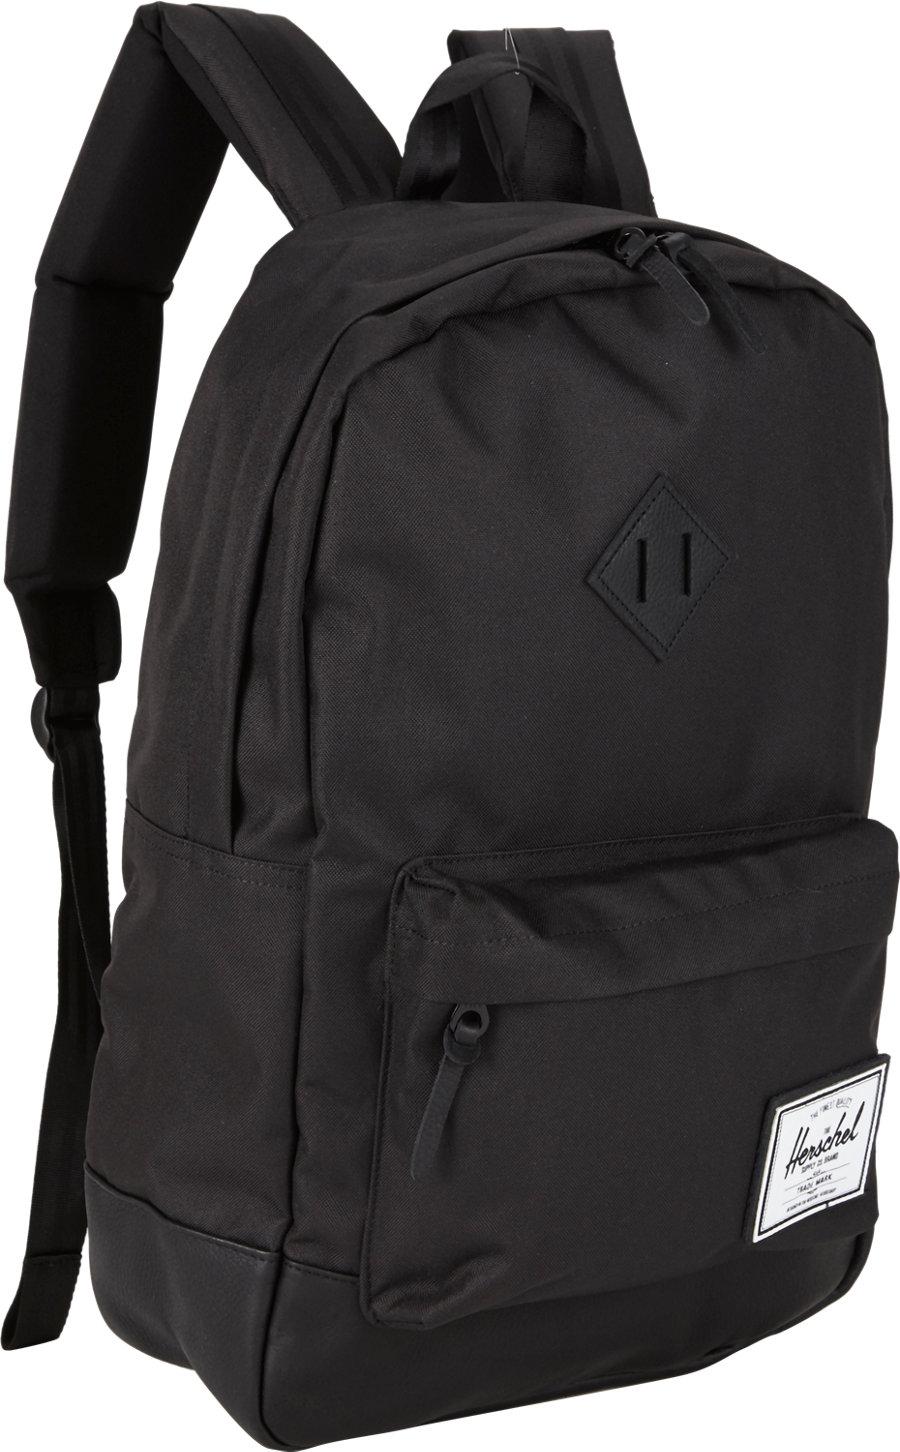 b9327b23e78 Herschel Supply Co. Heritage Backpack in Black - Lyst